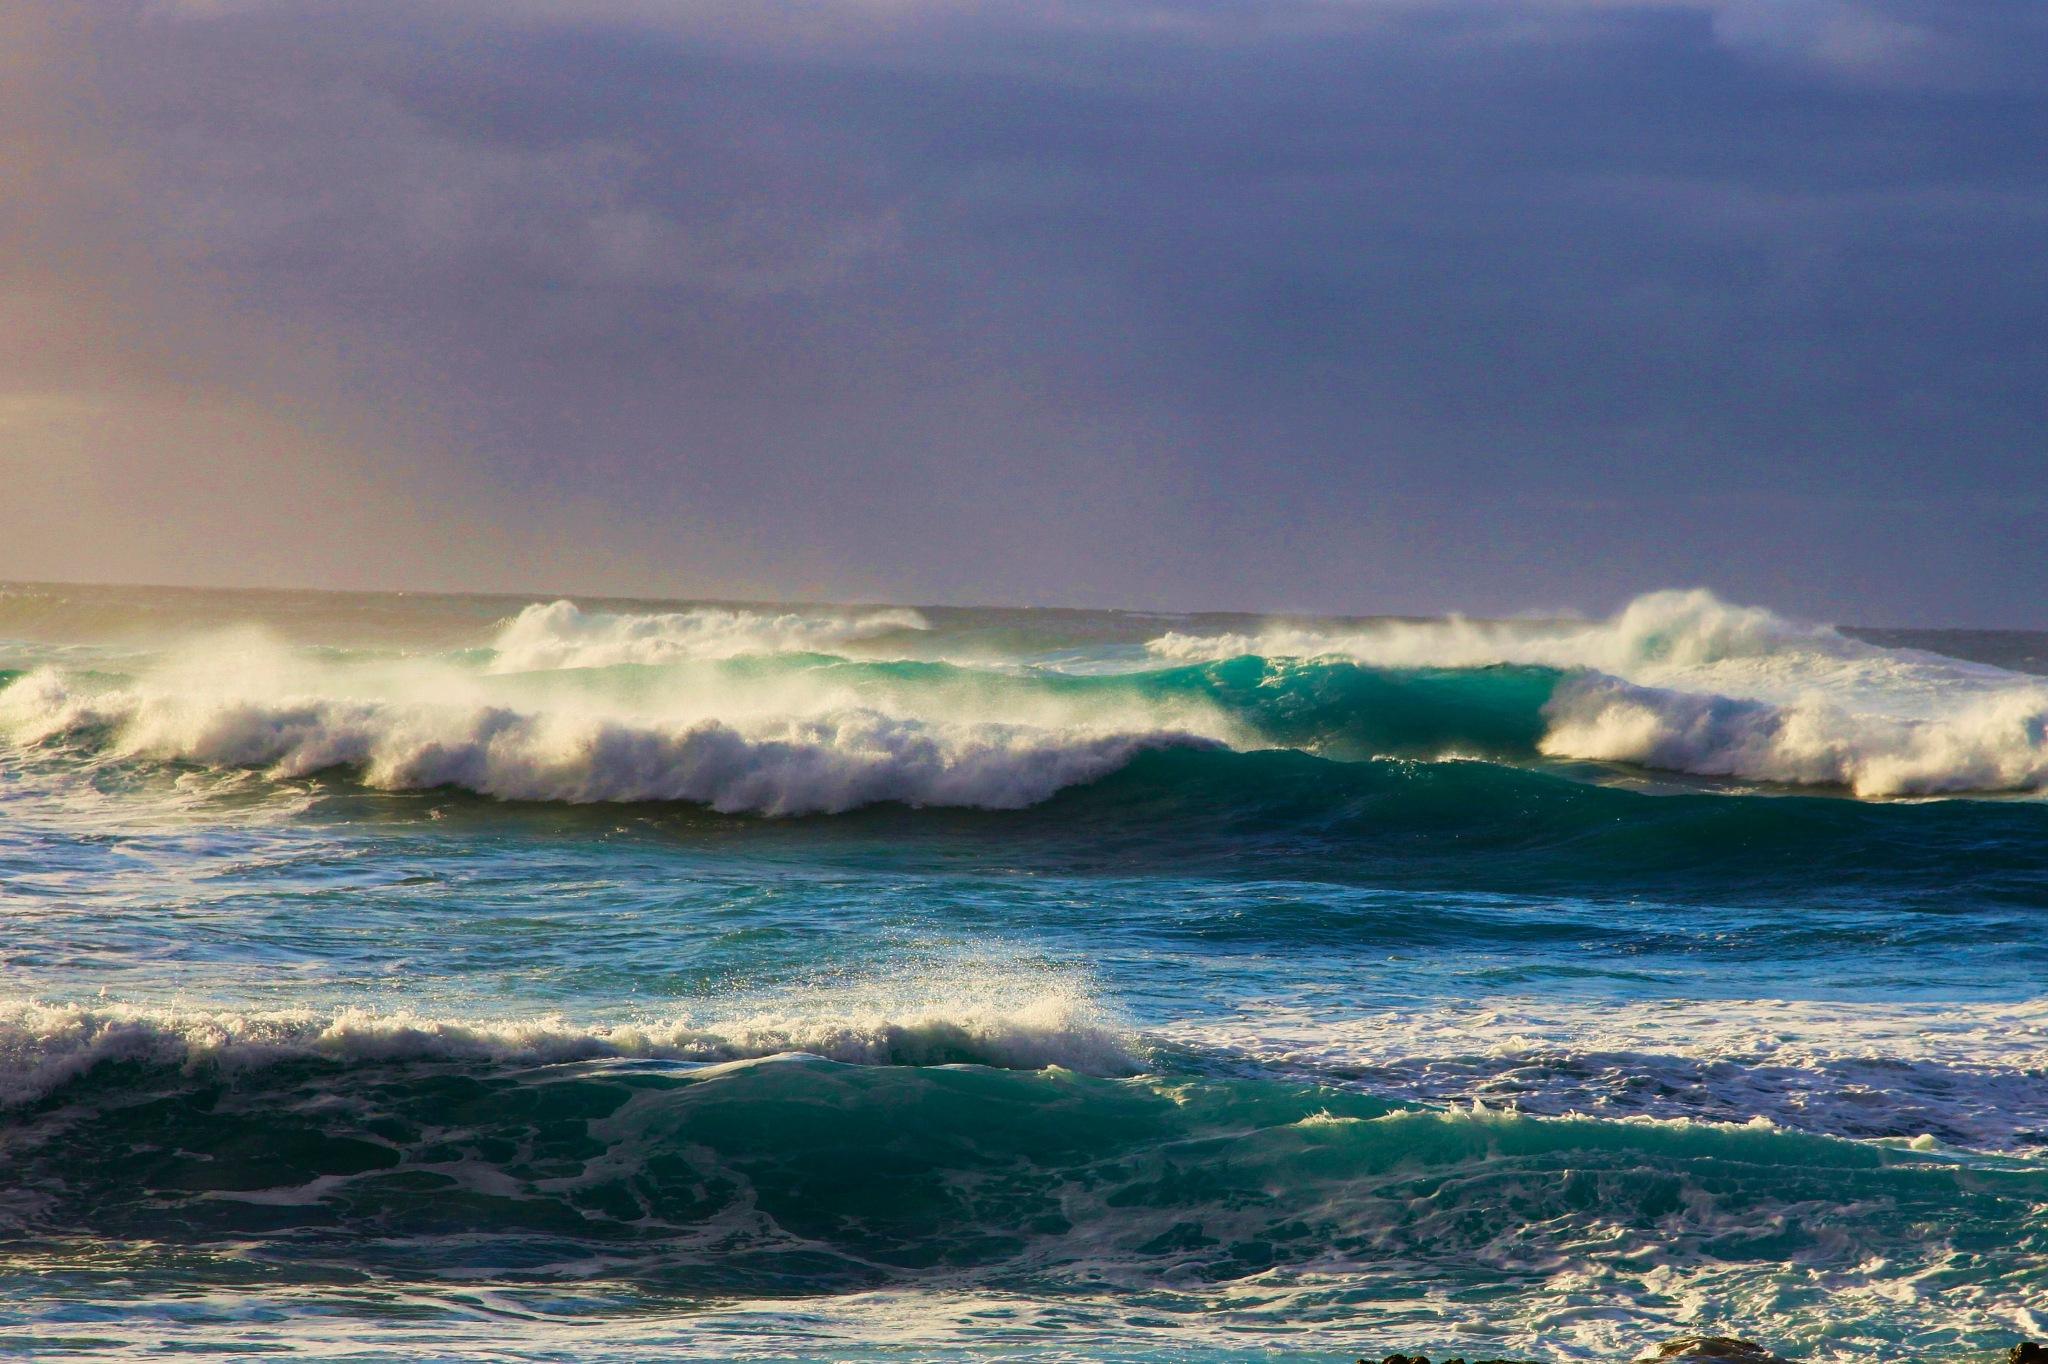 sun on surf by Miloliidrifter